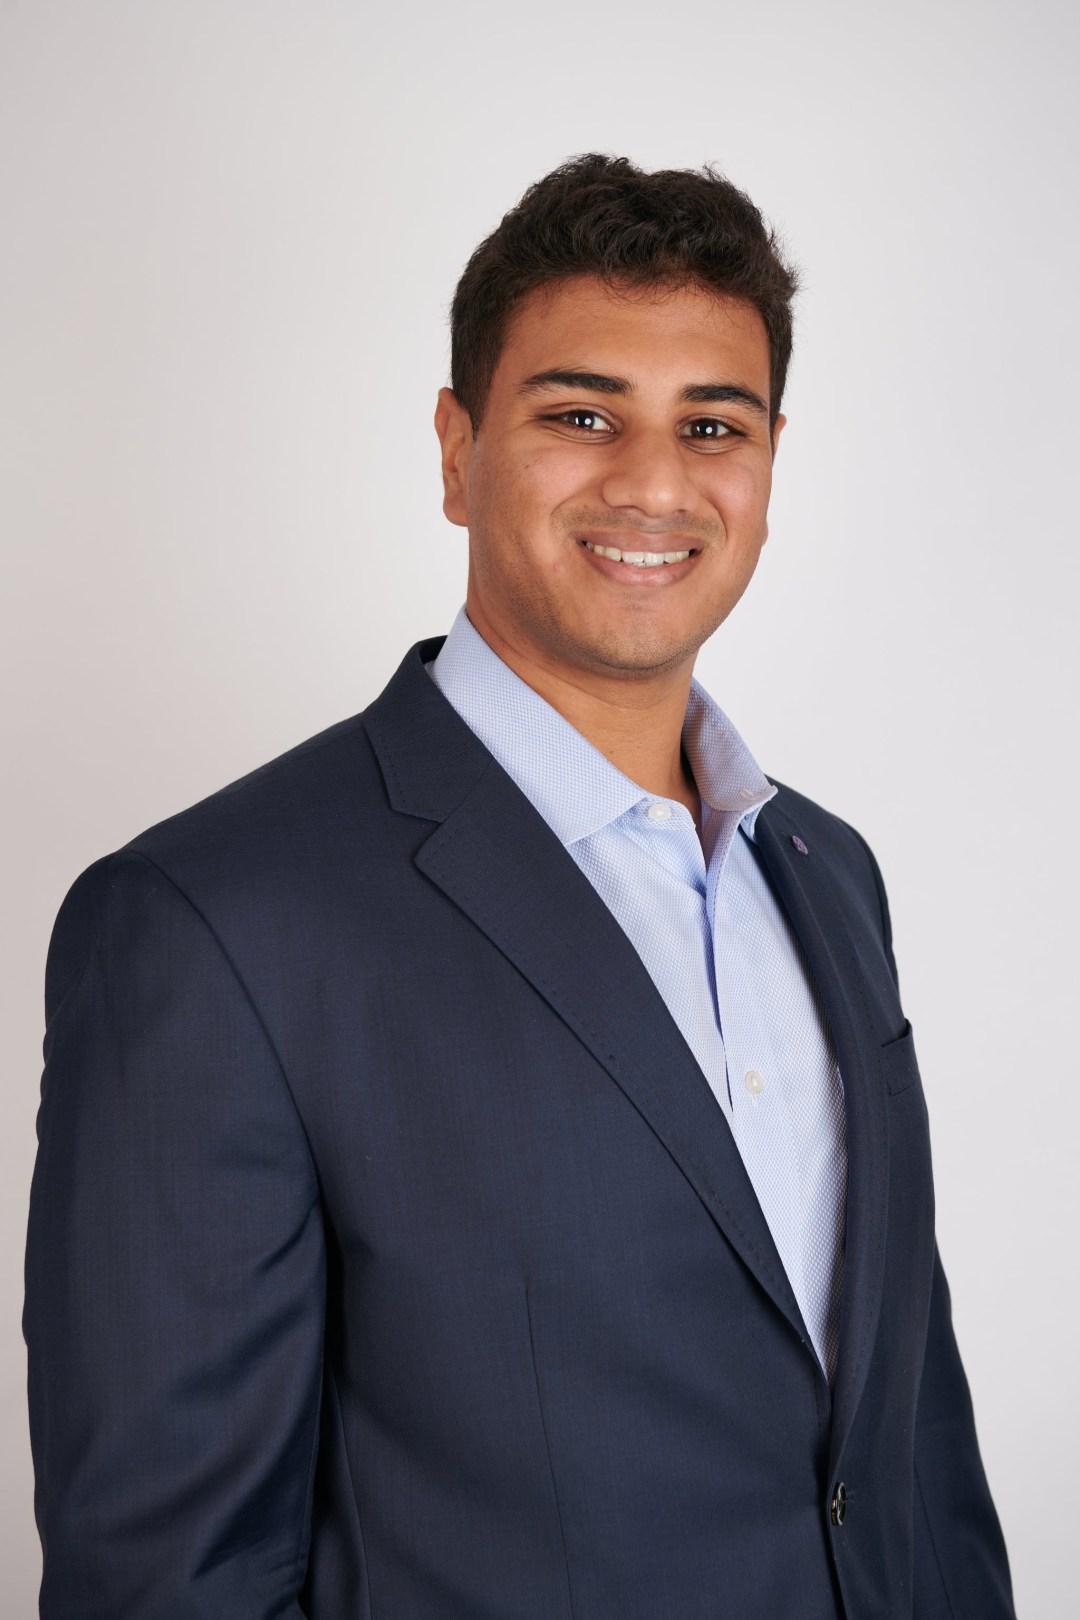 Rajan Meswani